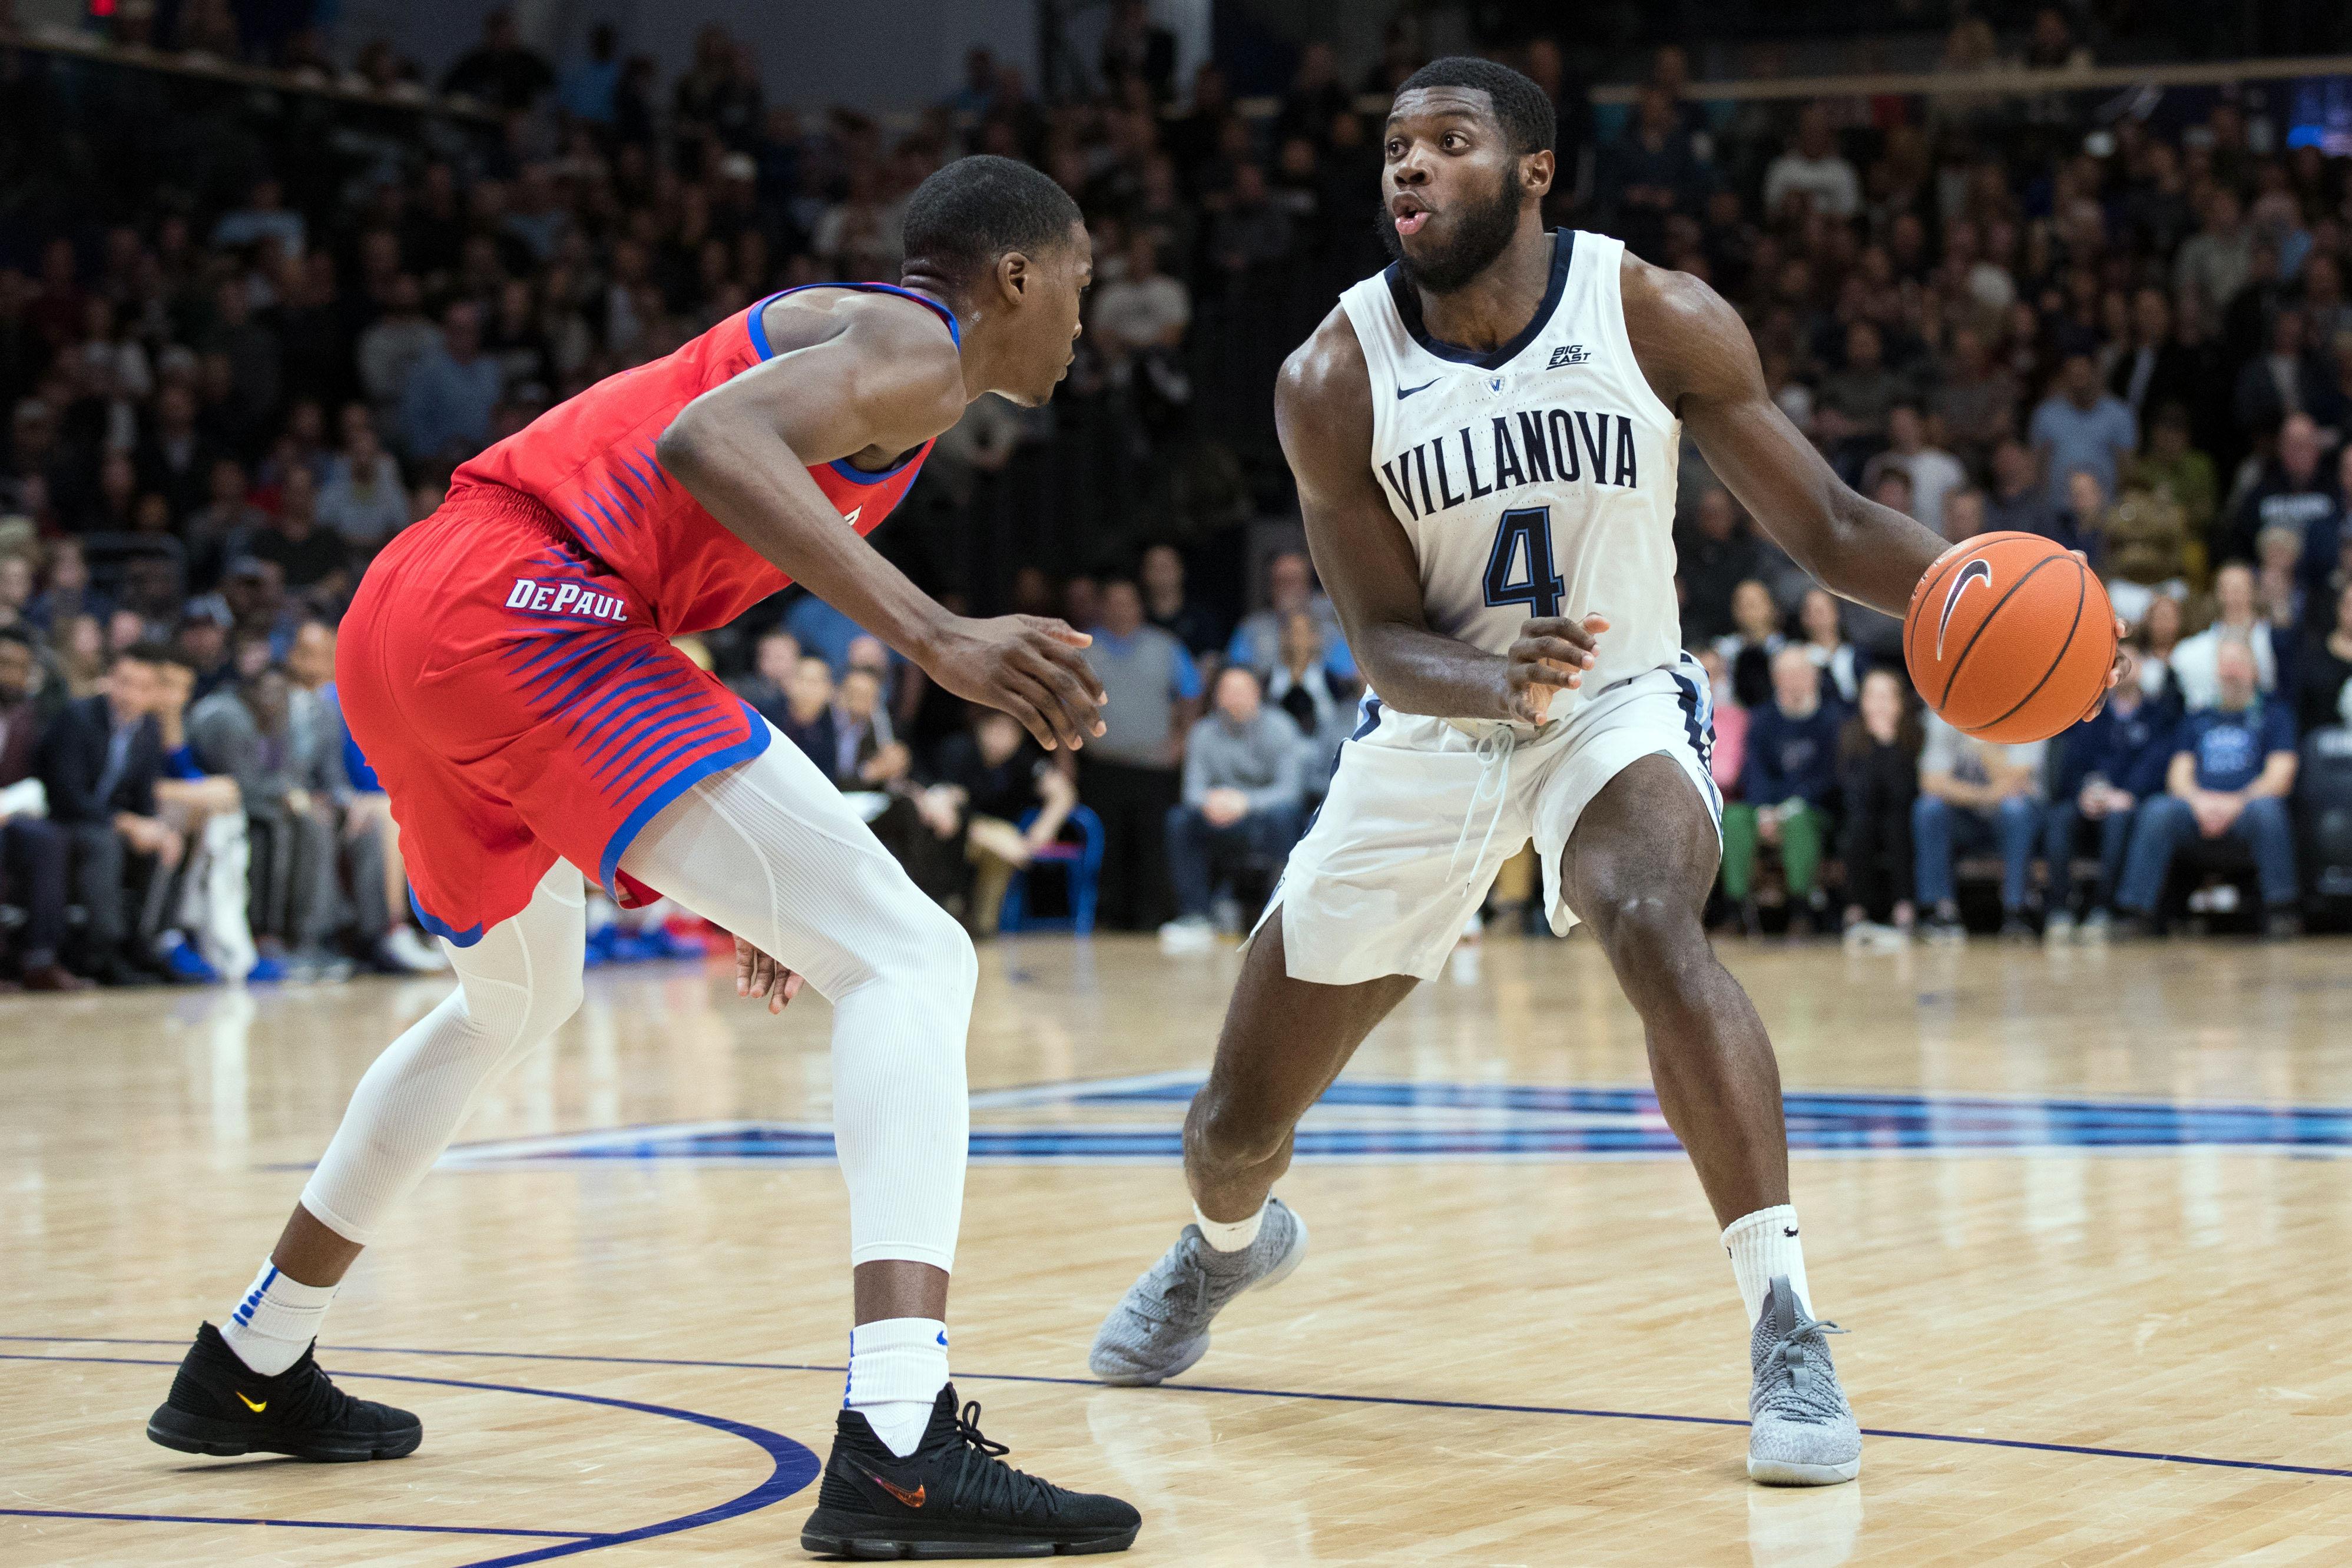 NCAA Basketball: DePaul at Villanova